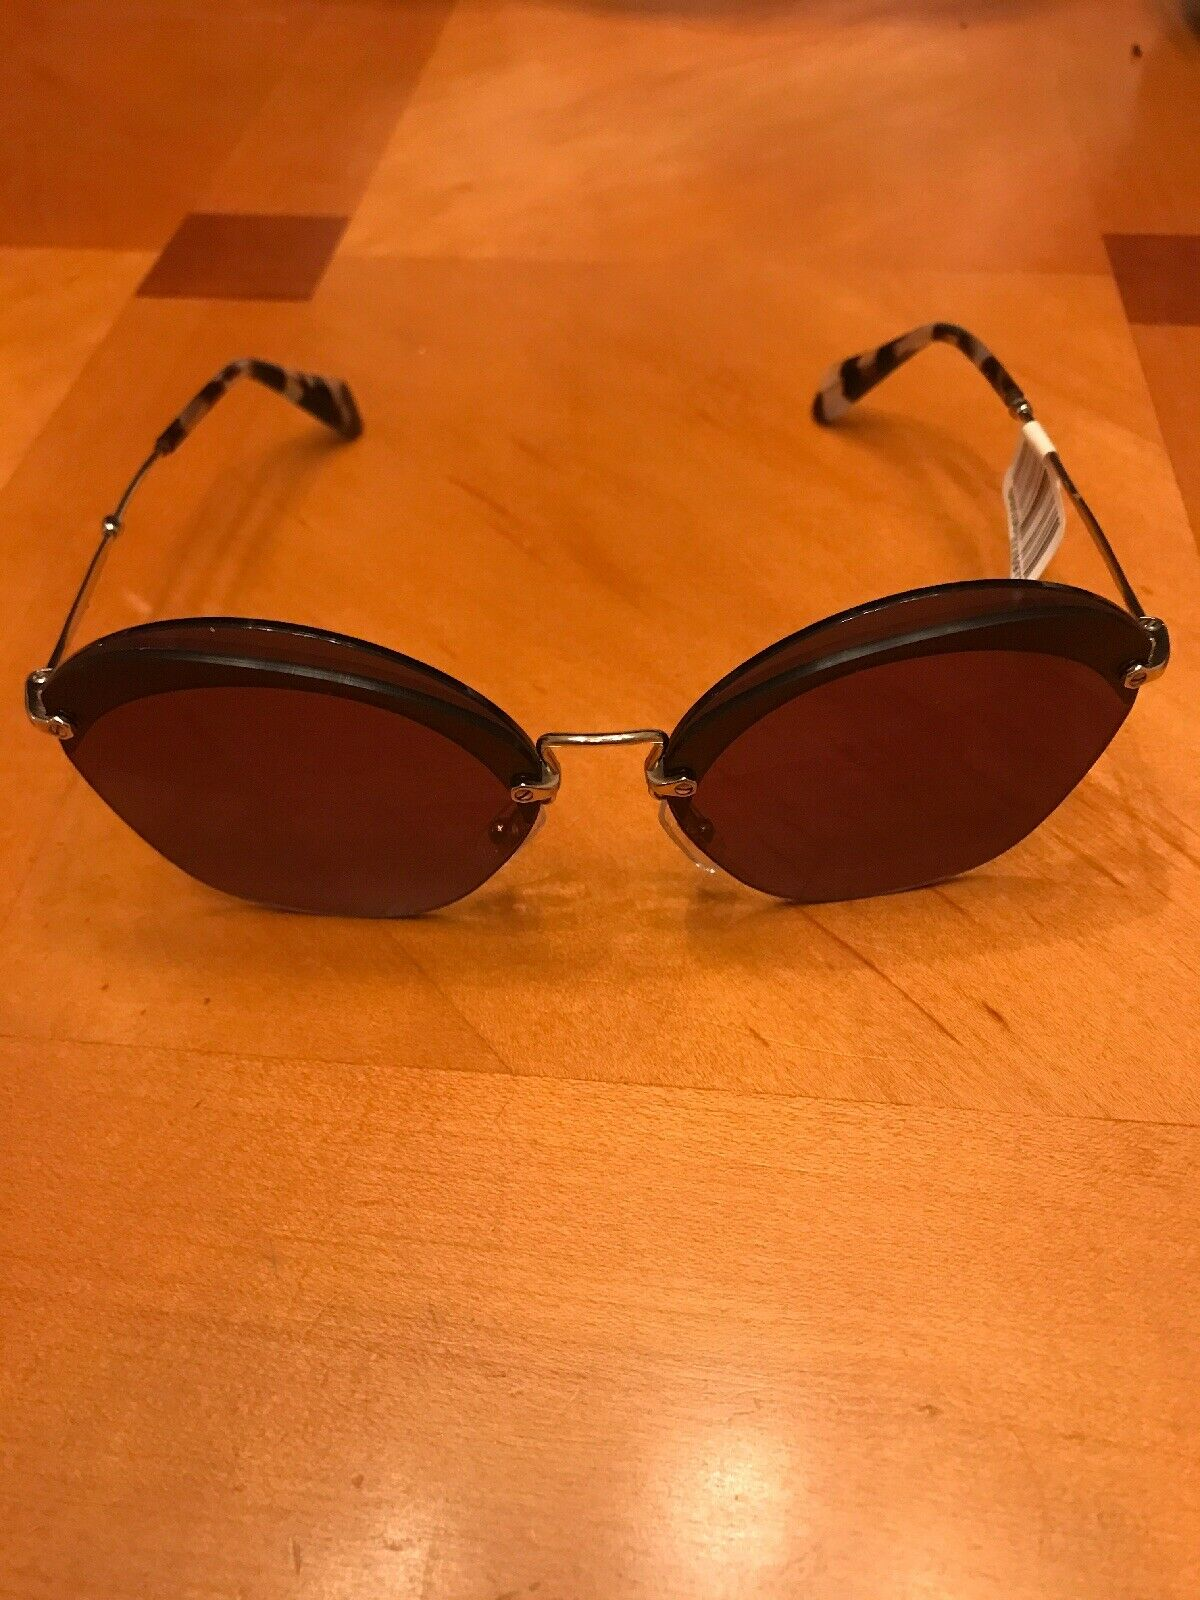 ***NEW WITH TAGS*** Miu Miu SMU 53S Gold&Tortoise Sunglasses 62MM